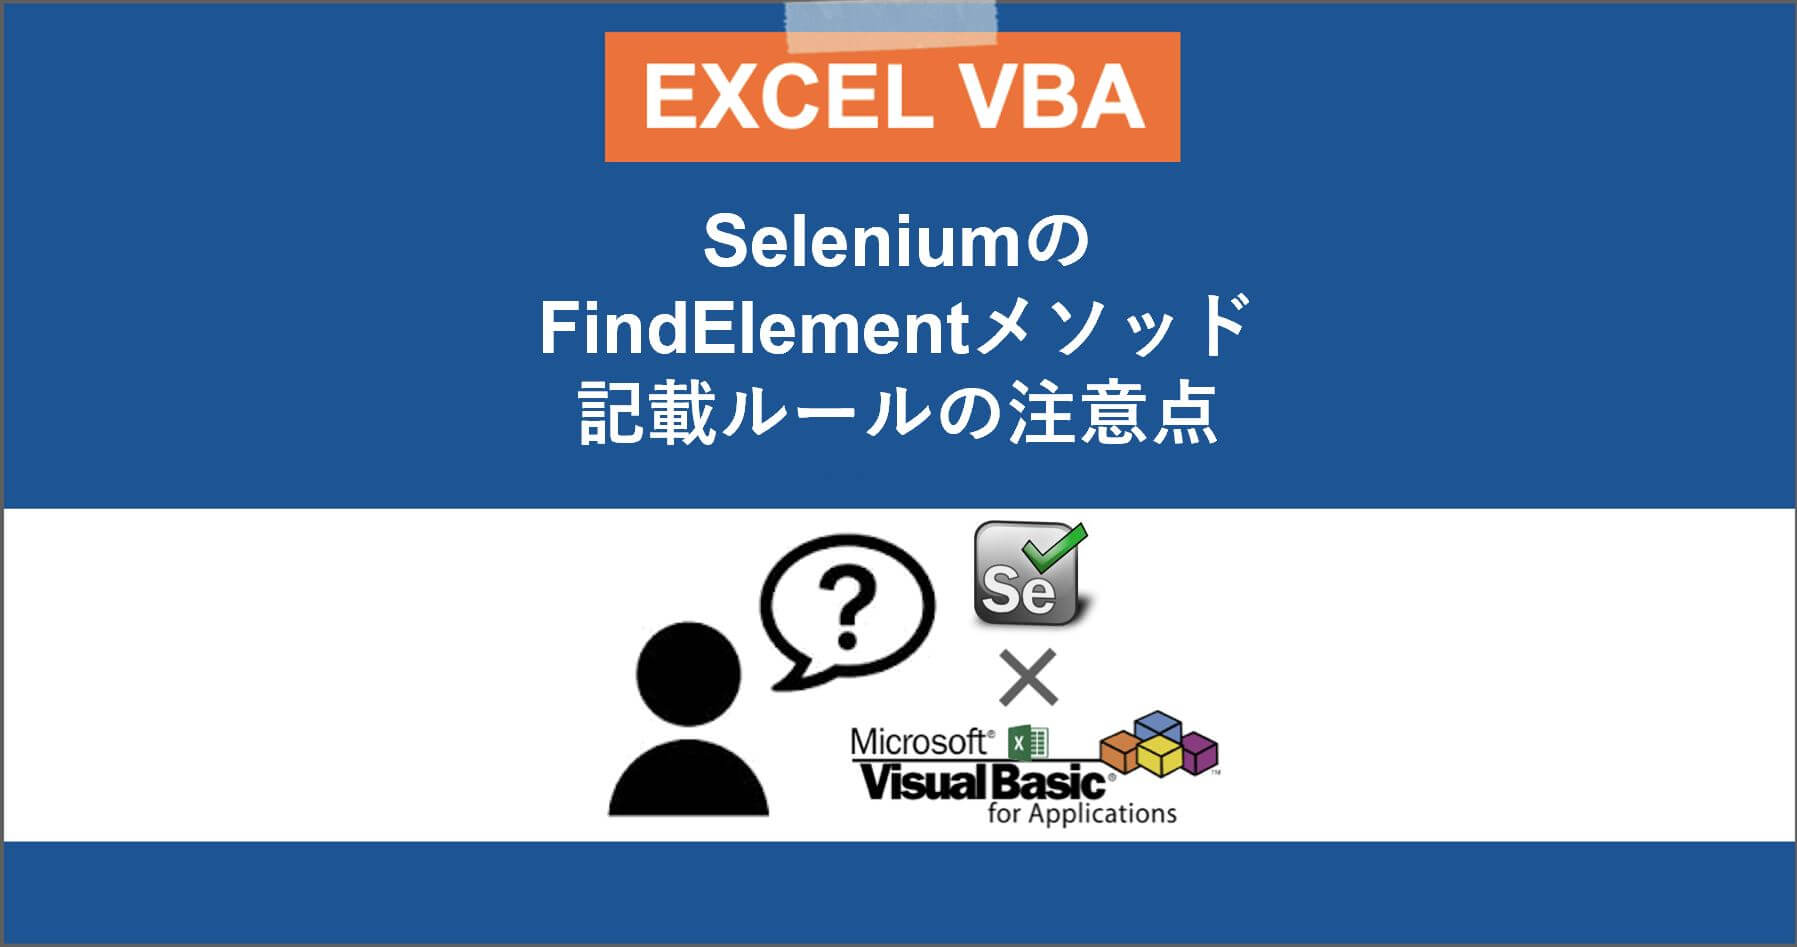 SeleniumのFindElementが上手く行かない場合の対処法